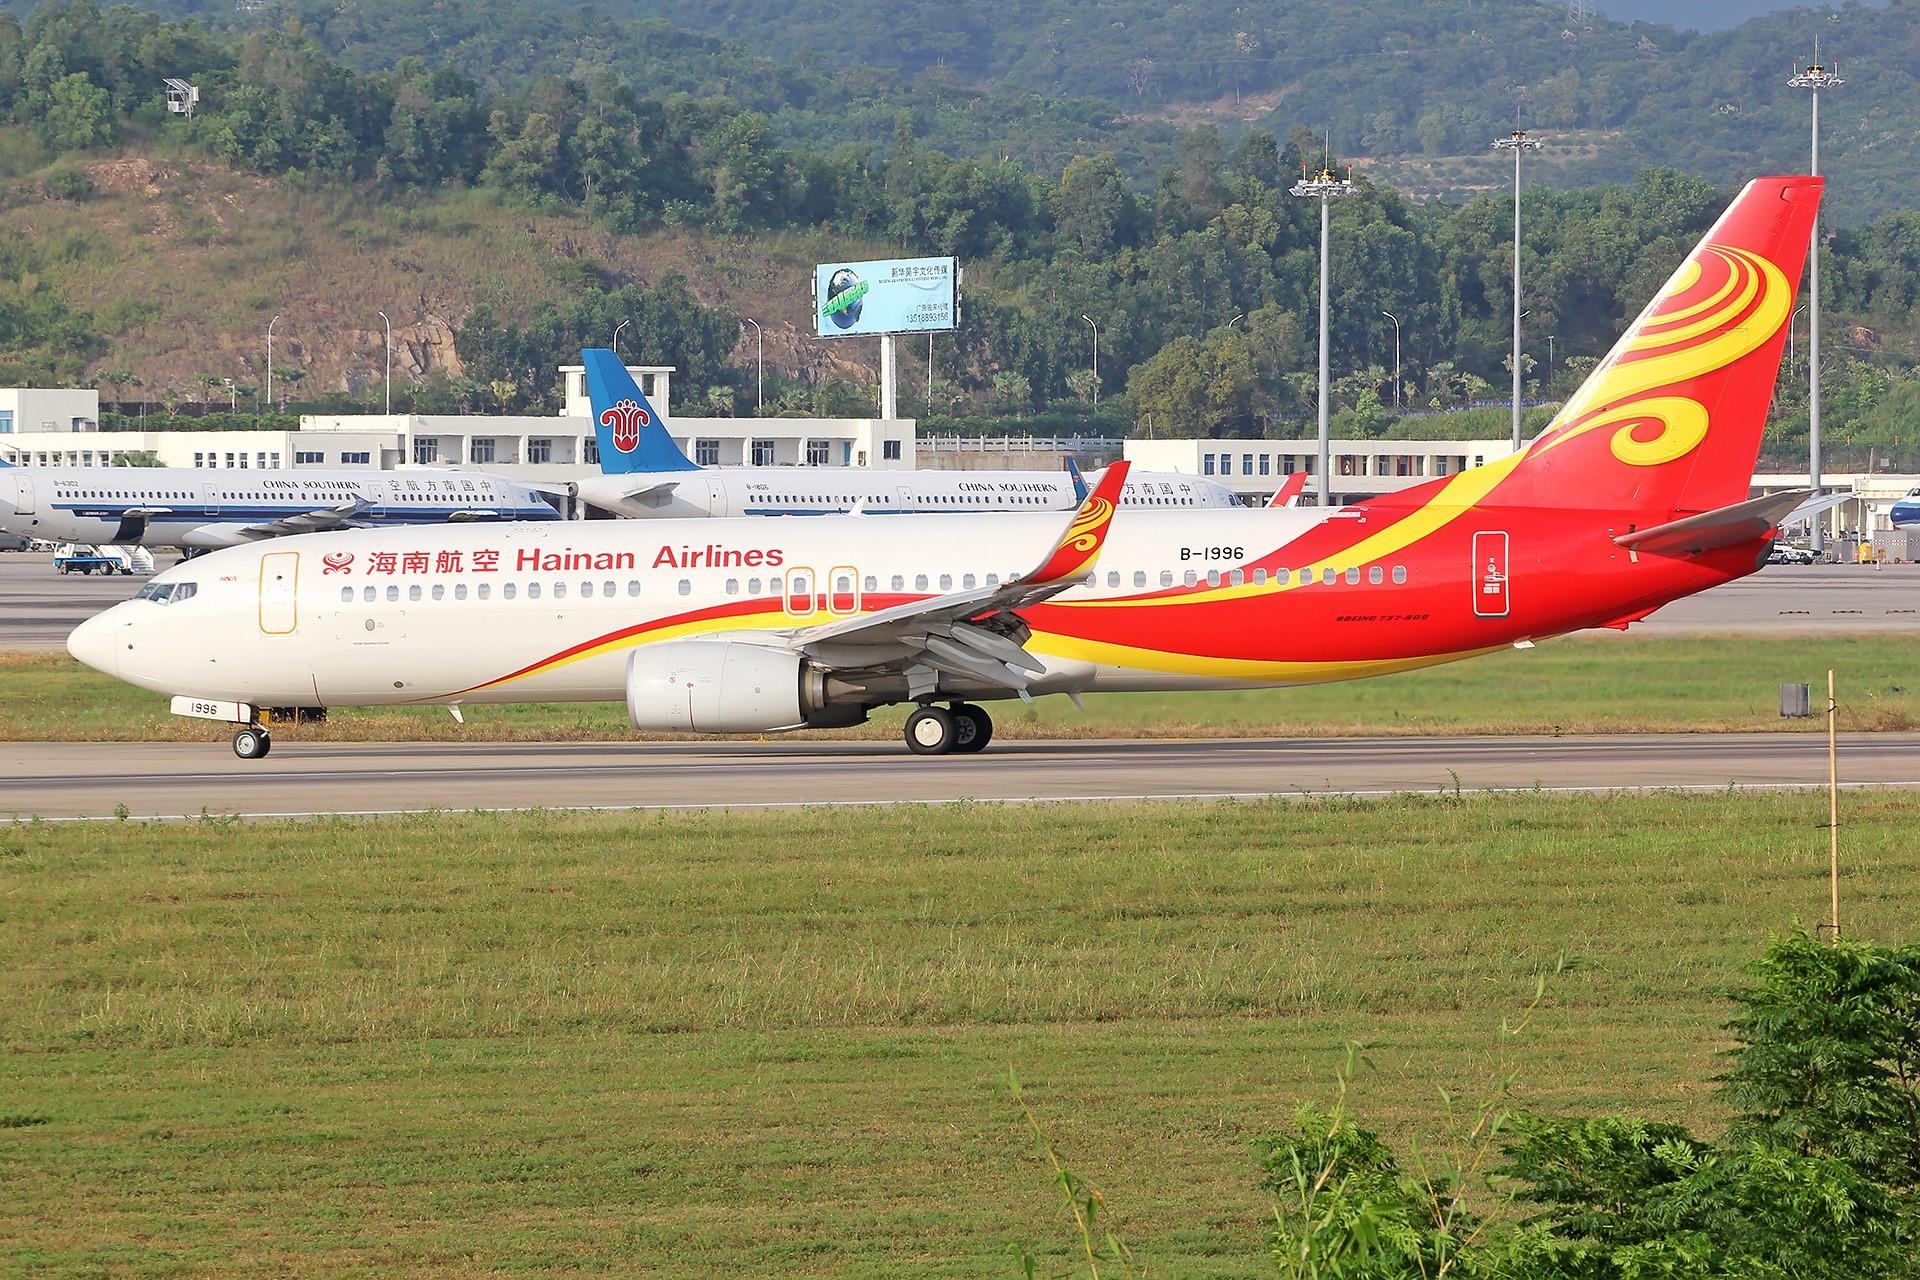 Re:[原创]。。。[SYX]北纬18°的三亚日记。。。 BOEING 737-800 B-1996 中国三亚凤凰国际机场